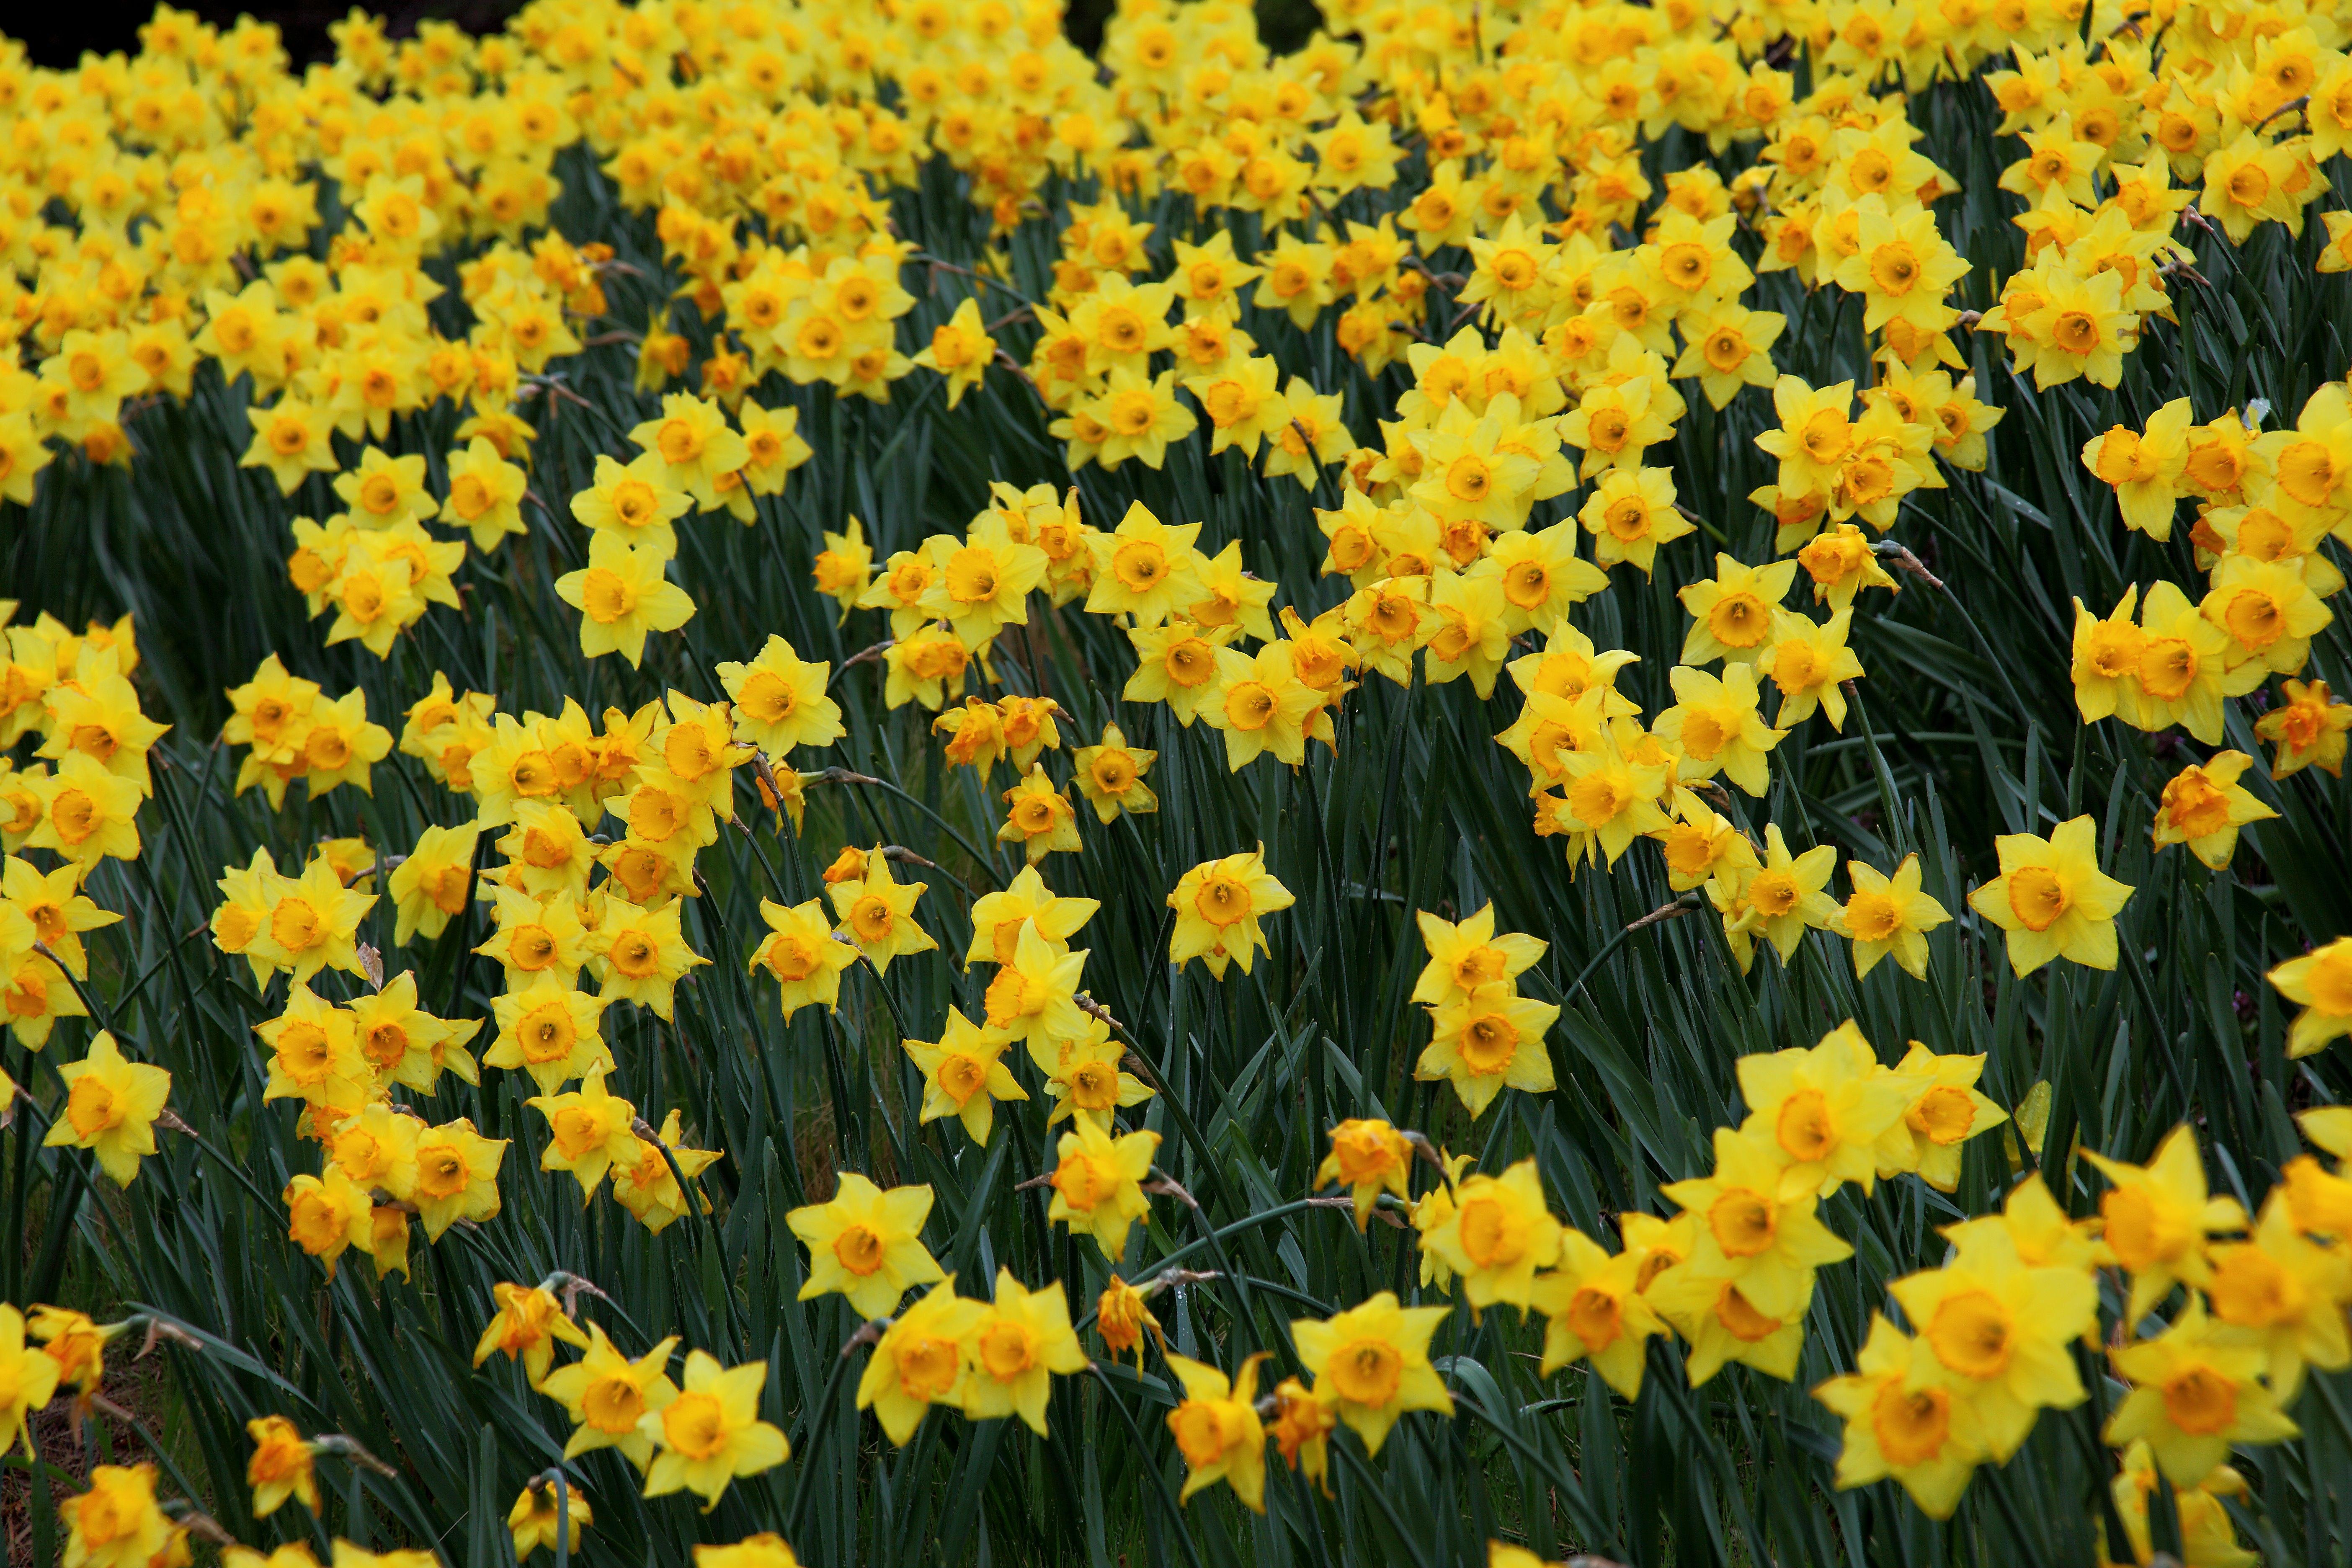 Filefield yellow daffodil flowers west virginia forestwander filefield yellow daffodil flowers west virginia forestwanderg mightylinksfo